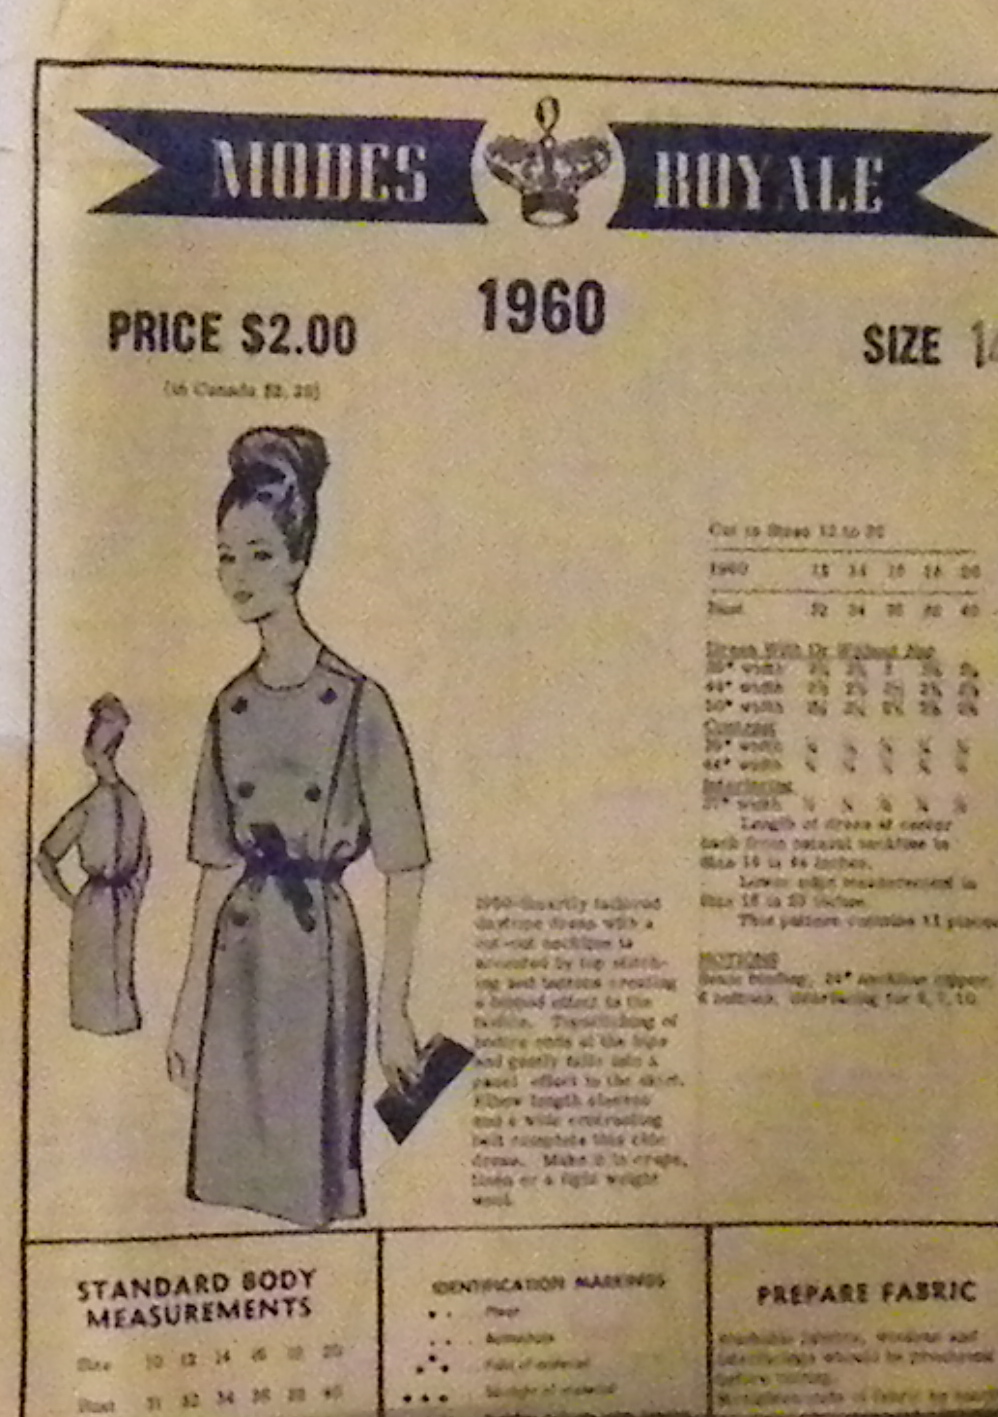 Modes Royale 1960